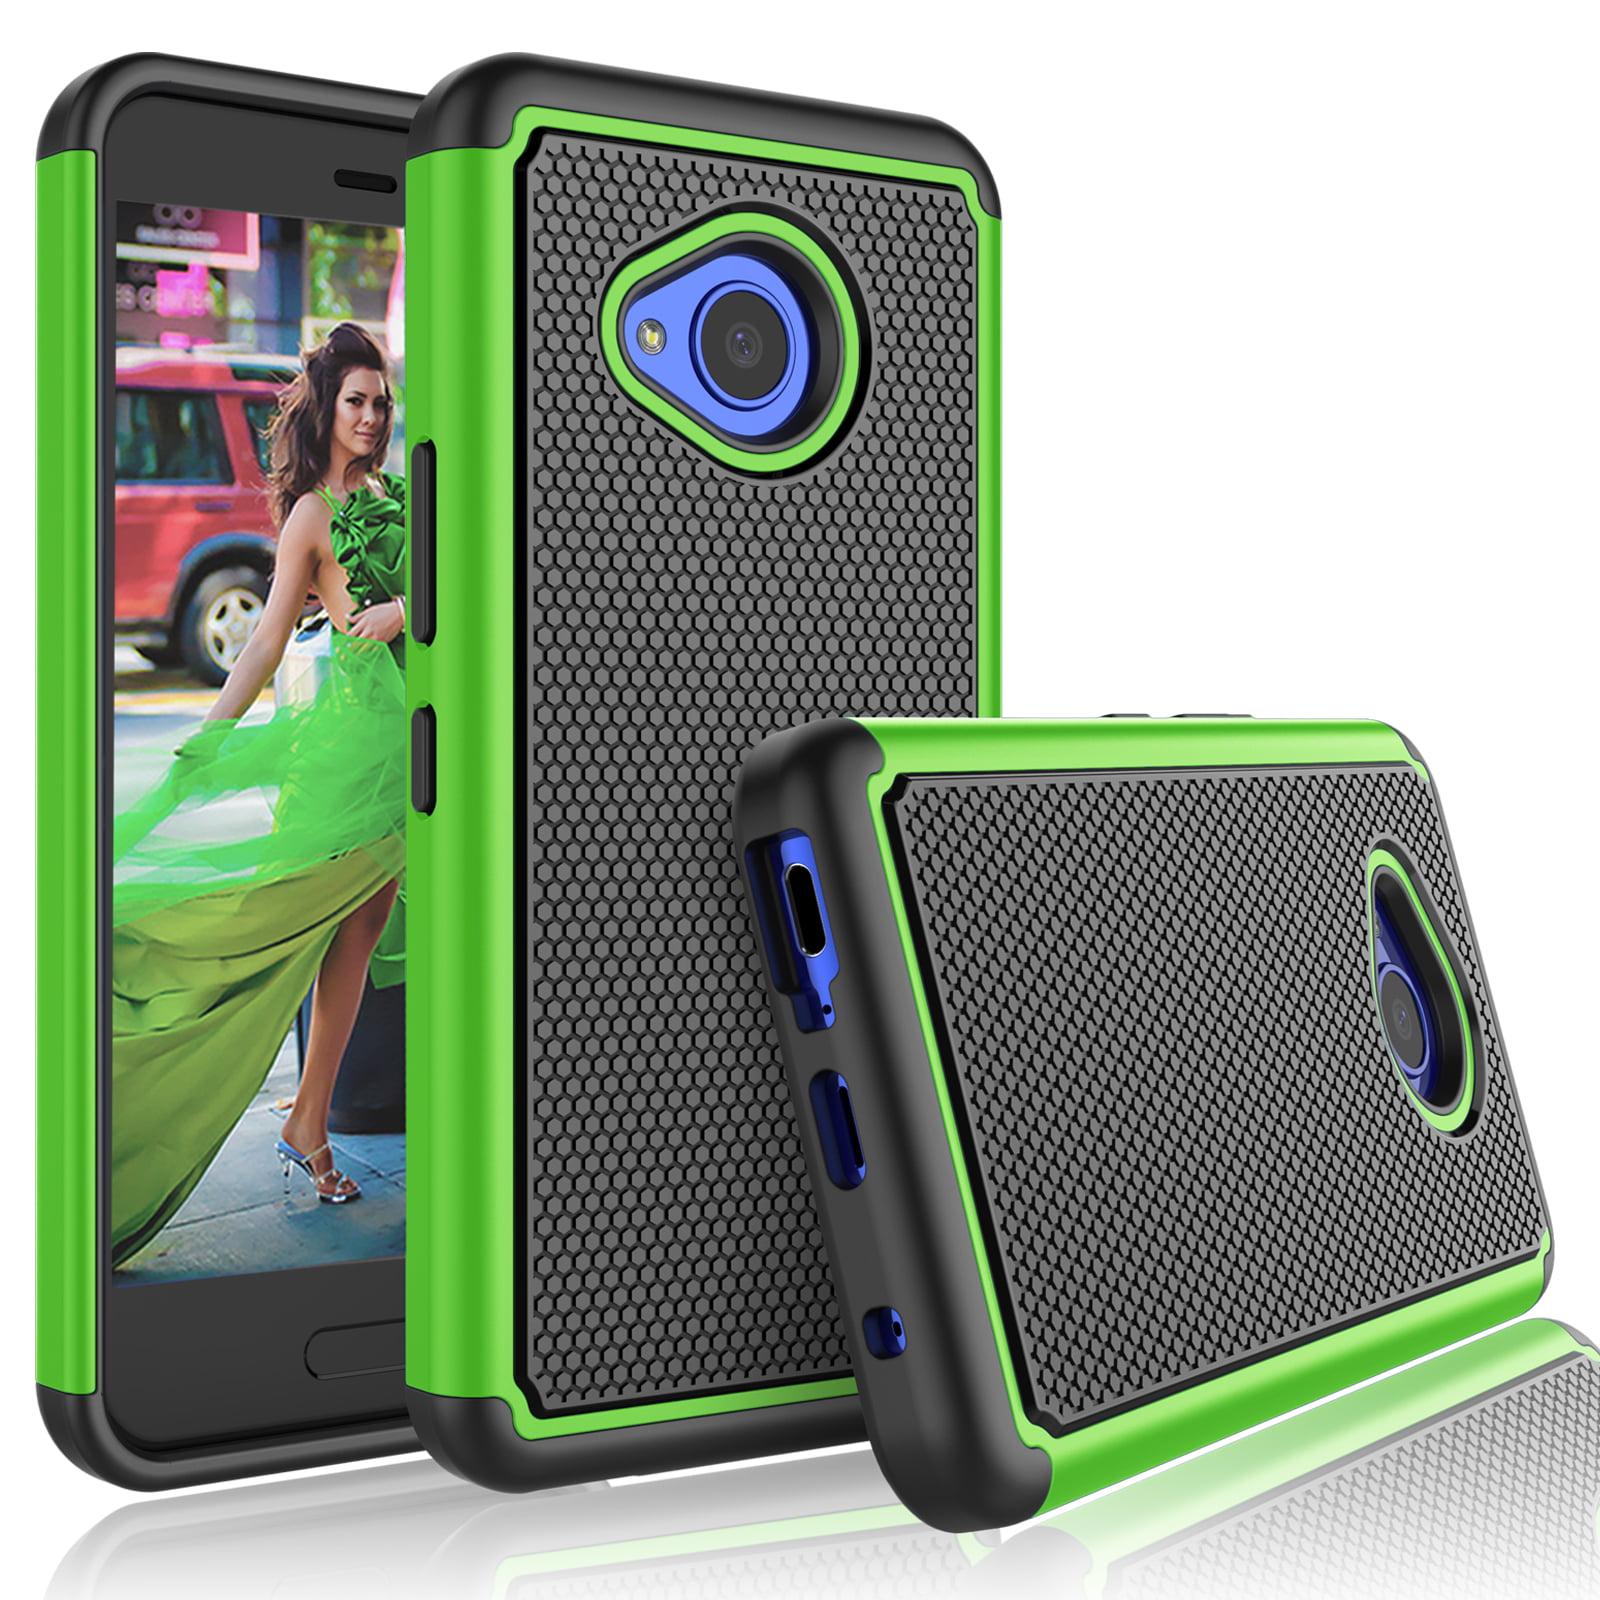 timeless design edca8 99c14 HTC U11 Life Case, HTC U 11 Life Case For Girls, Tekcoo [Tmajor] Shock  Absorbing [Hot Pink] Rubber Plastic Scratch Resistant Cute Rugged Sturdy  Bumper ...